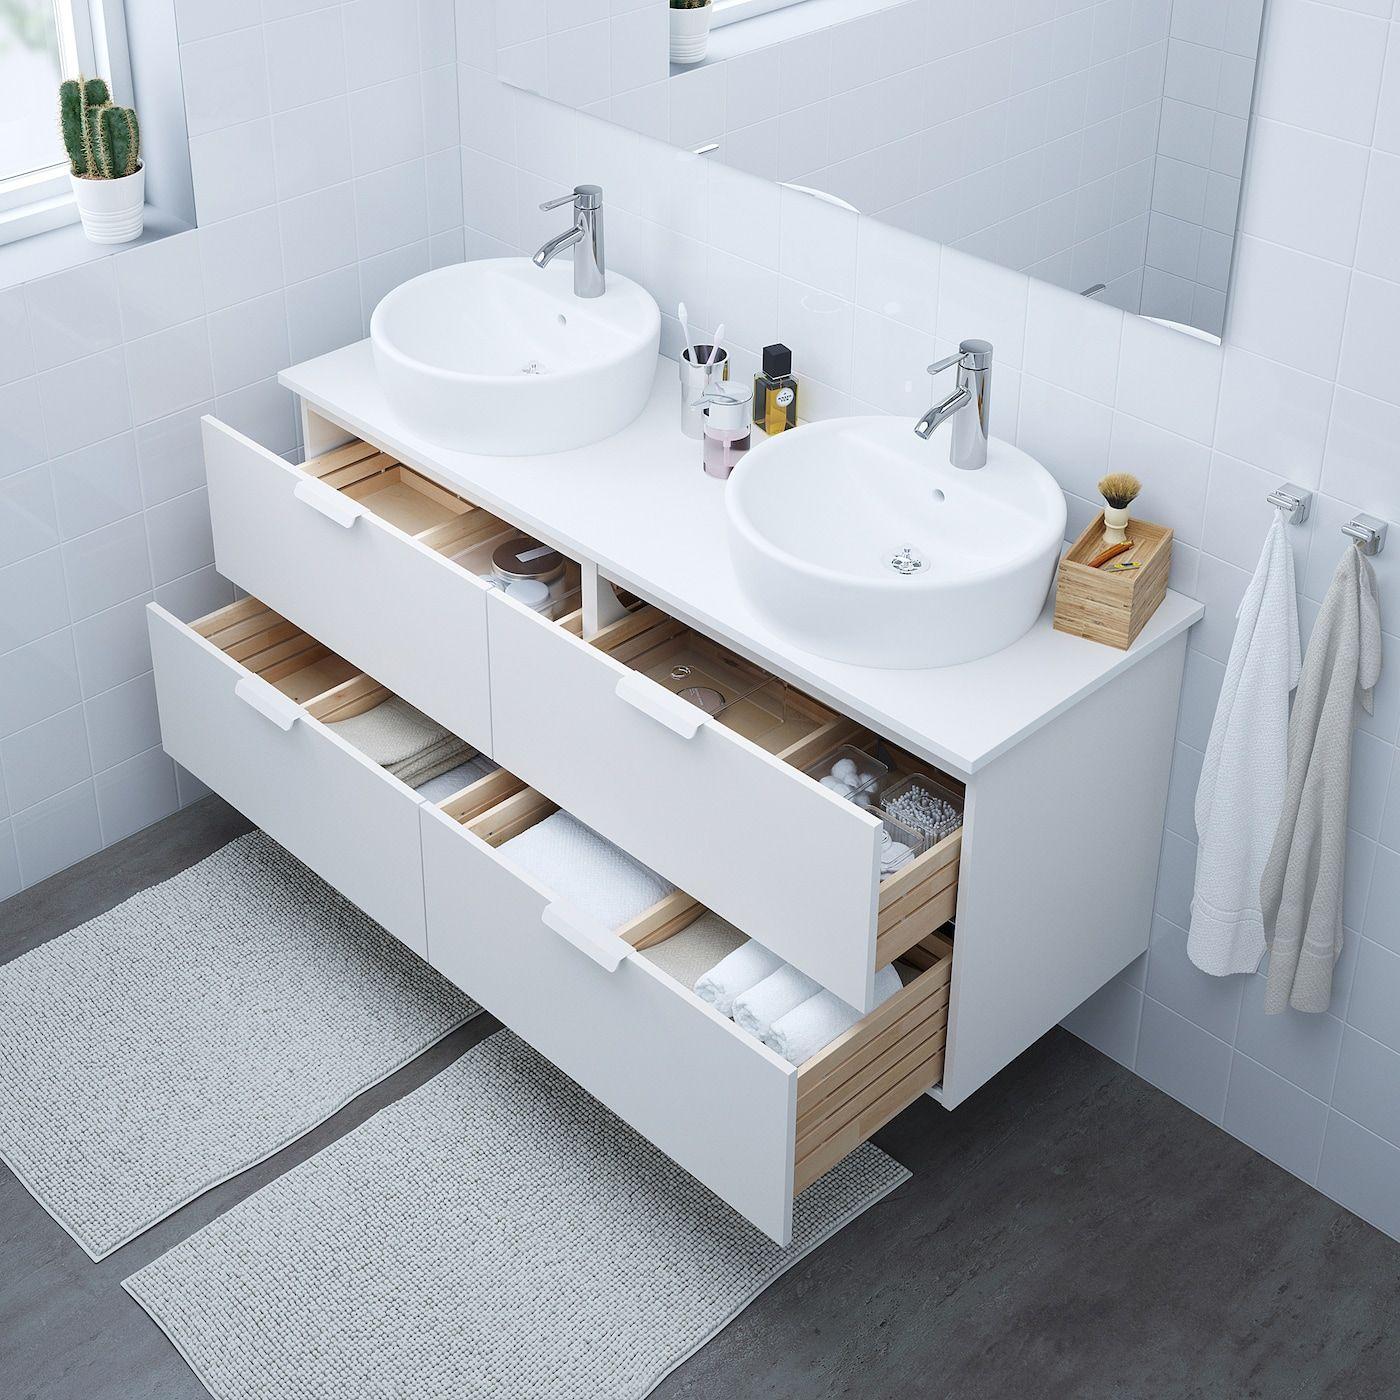 Godmorgon Bathroom Vanity White Canada Ikea In 2020 Ikea Vanity White Vanity Bathroom Ikea Godmorgon